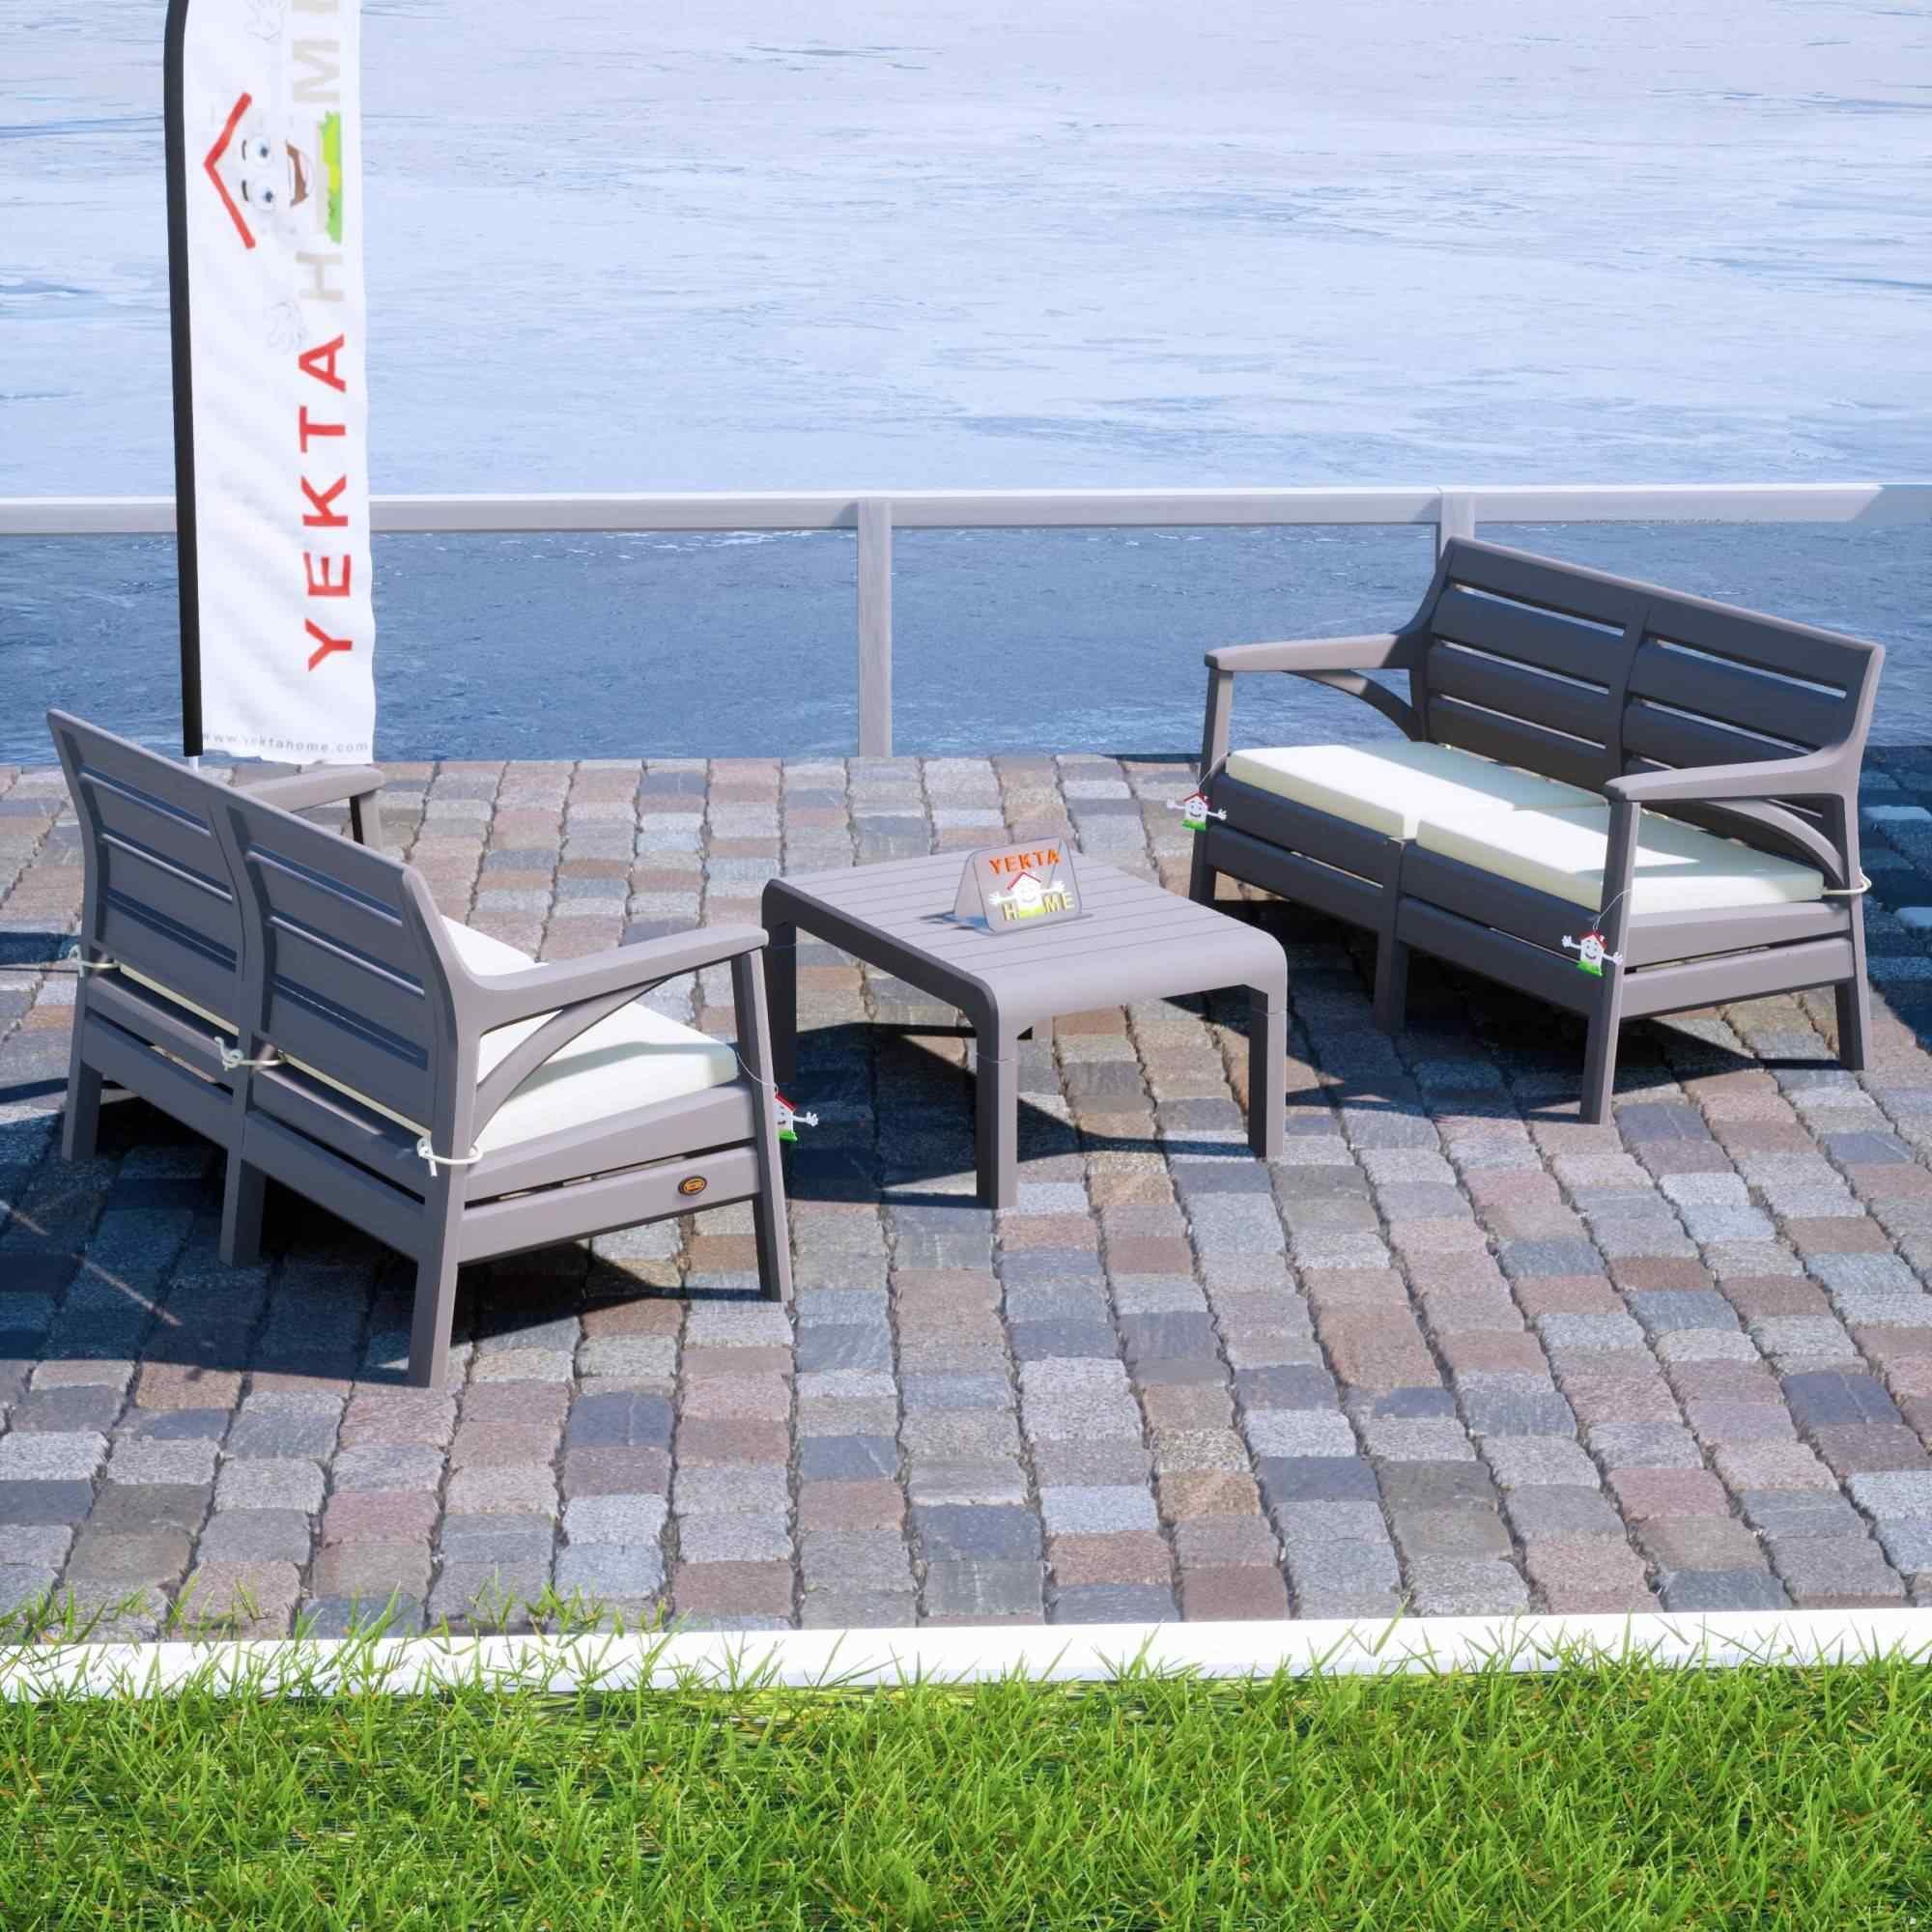 Holiday Torino Bahçe Takımı Oturma Grubu Balkon Seti Çöl Gri